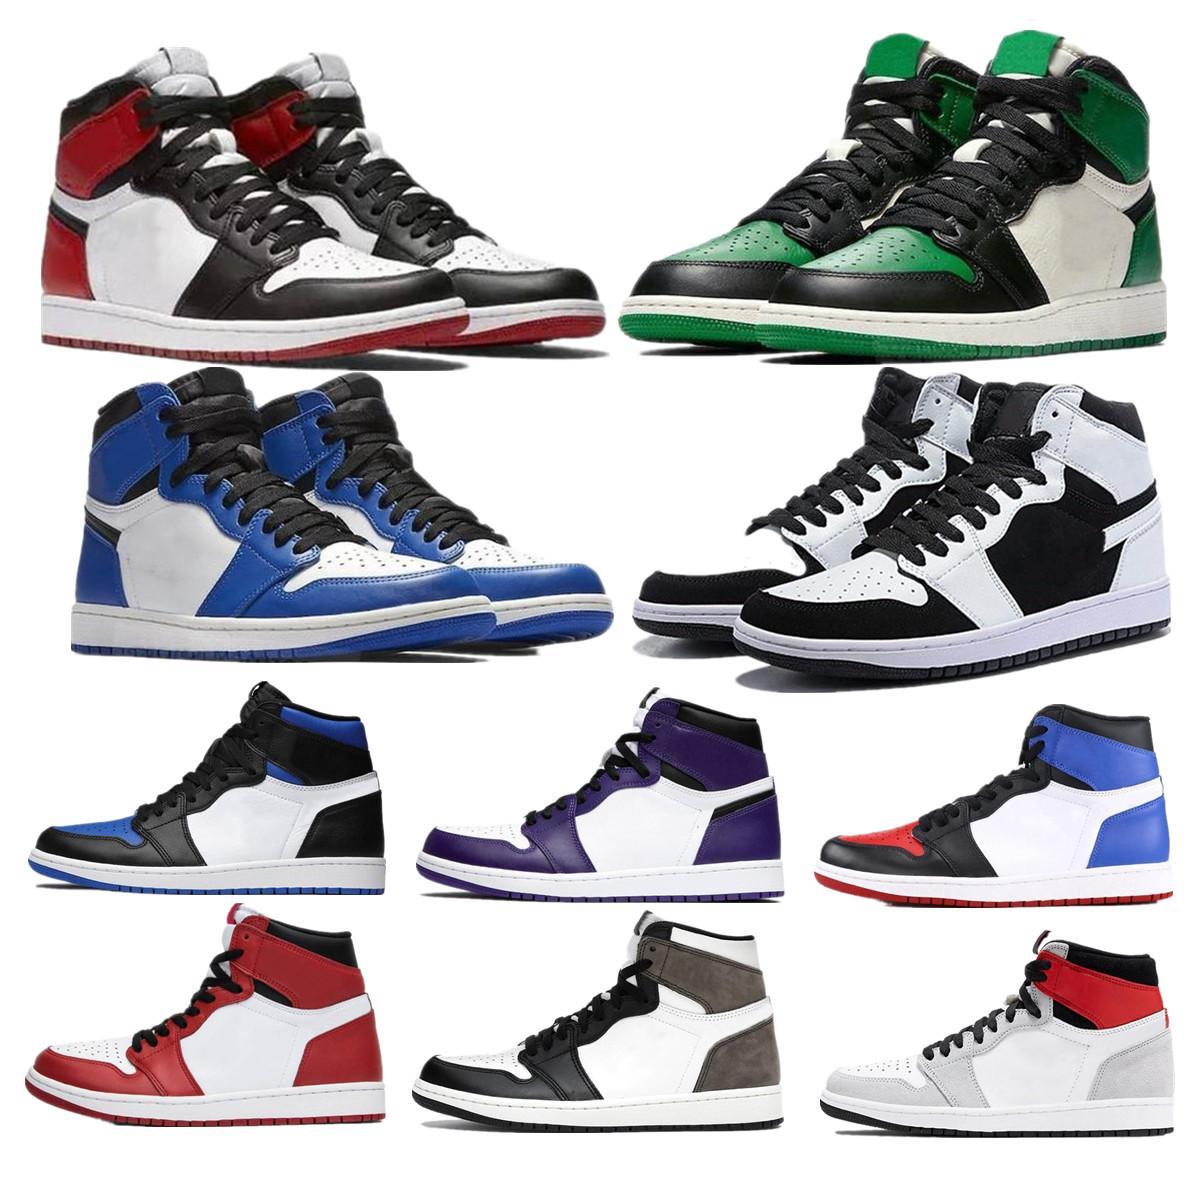 NIKE AIR MAX PLUS MENS TN Plus Ejecutar zapatos SE Ultra White Volt Black Hyper Blue Oreo Purple Designer Sneakers TNS Classic Aire Libre Entrenadores Tamaño 40-46